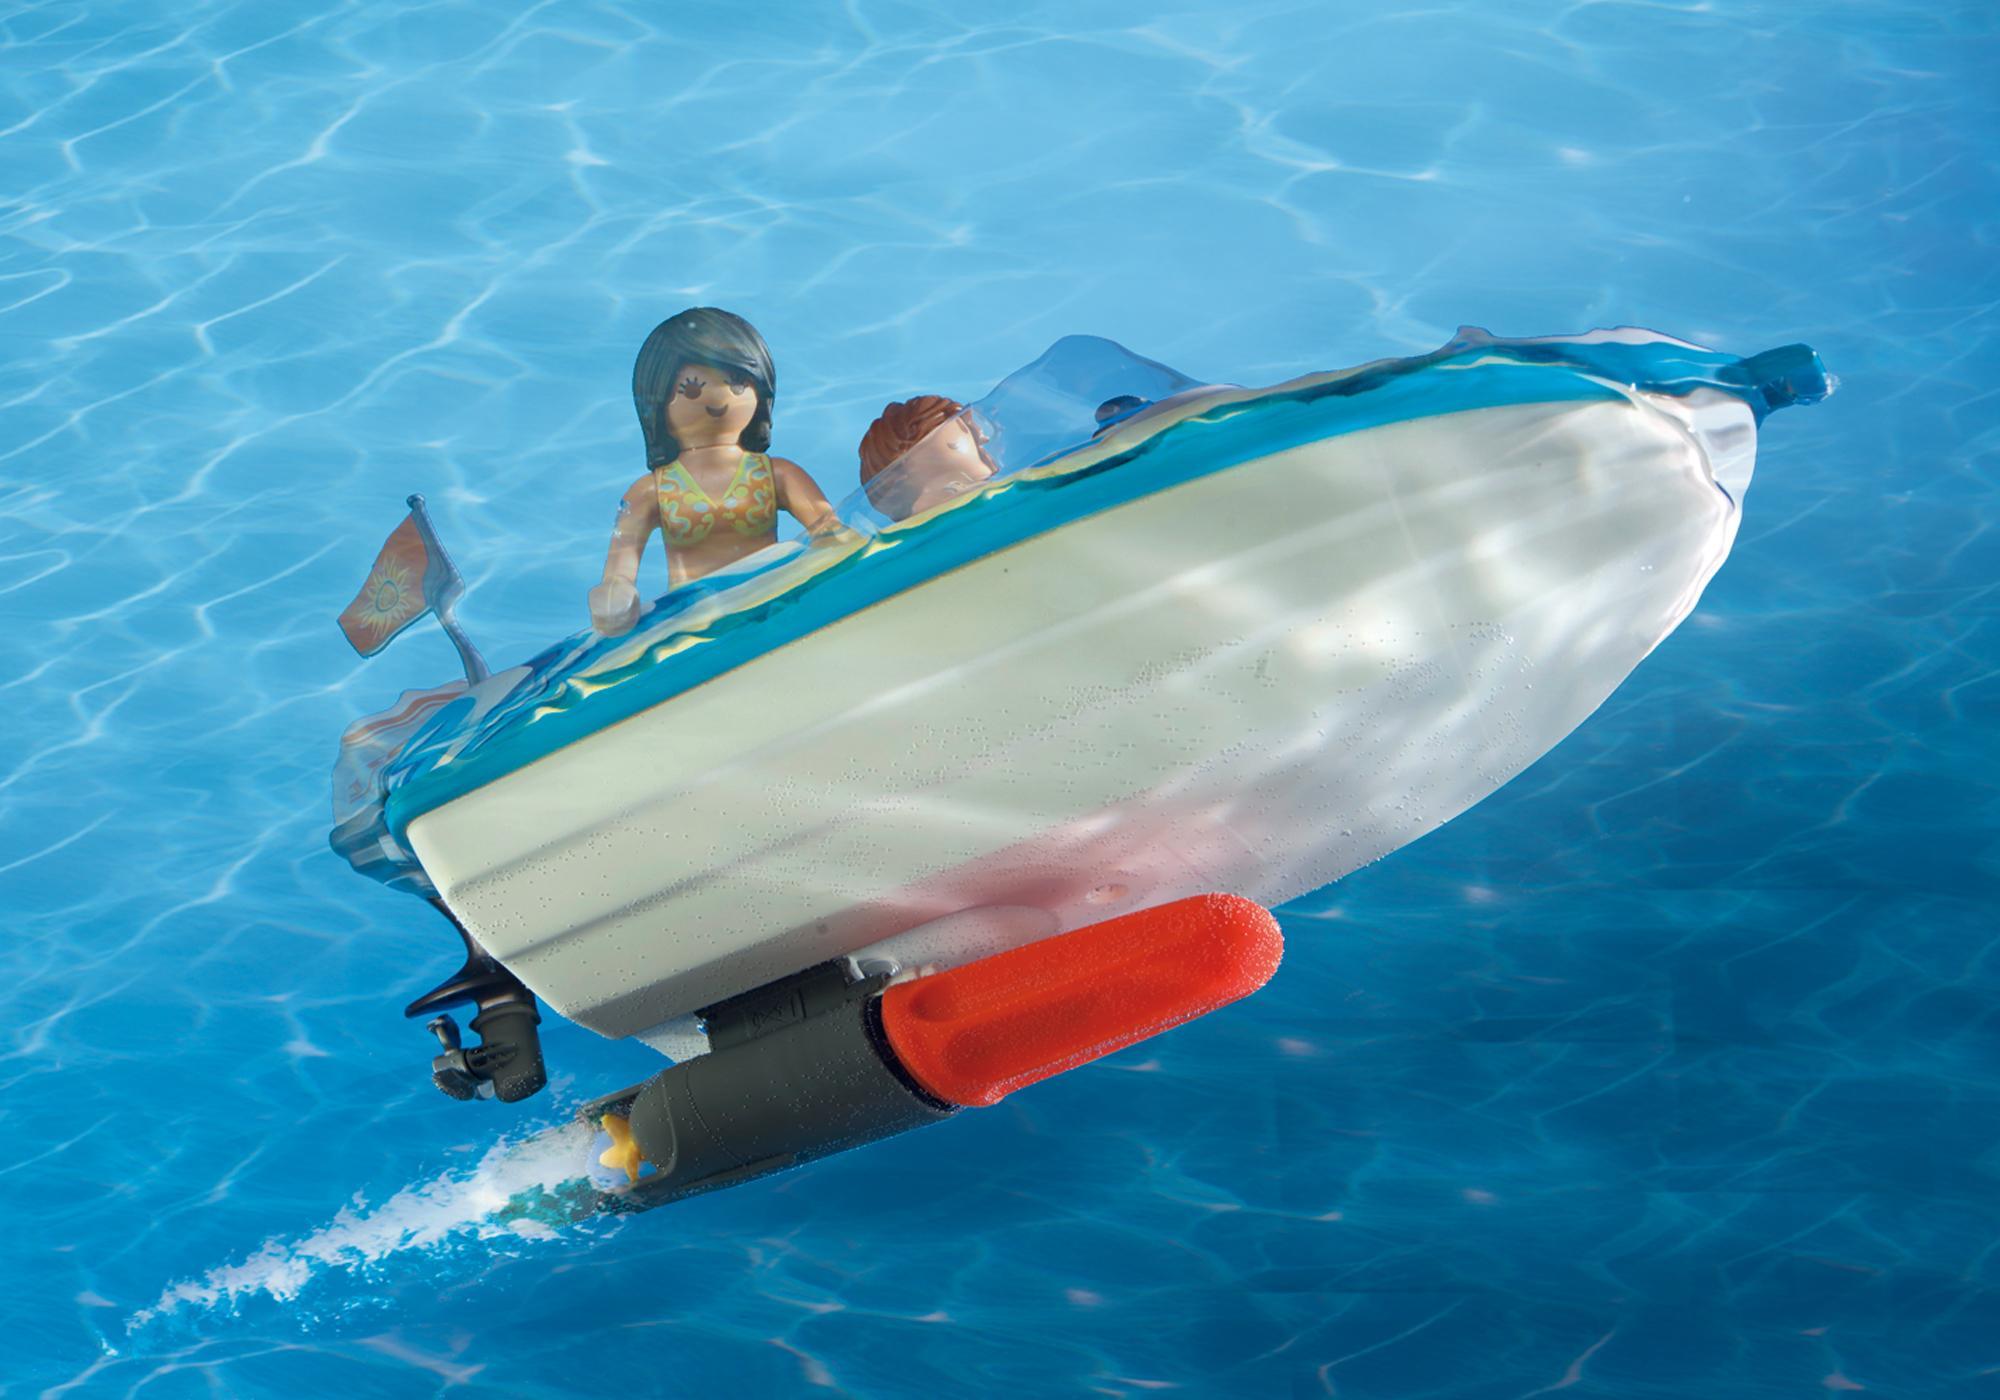 http://media.playmobil.com/i/playmobil/6864_product_extra3/Pick-up met speedboot met onderwatermotor